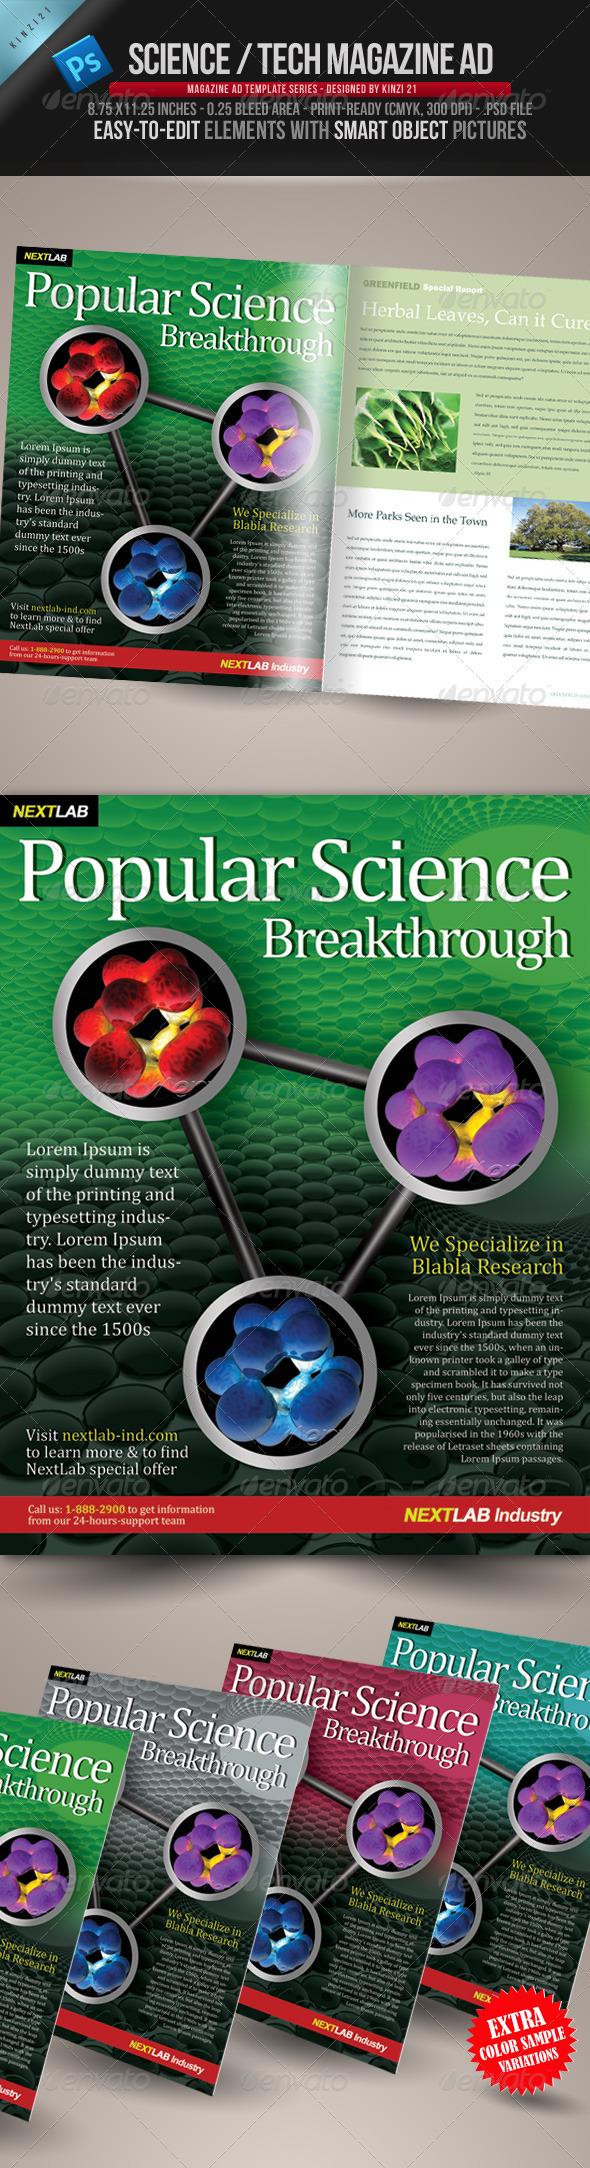 Science & Tech Magazine Ad Template - Magazines Print Templates